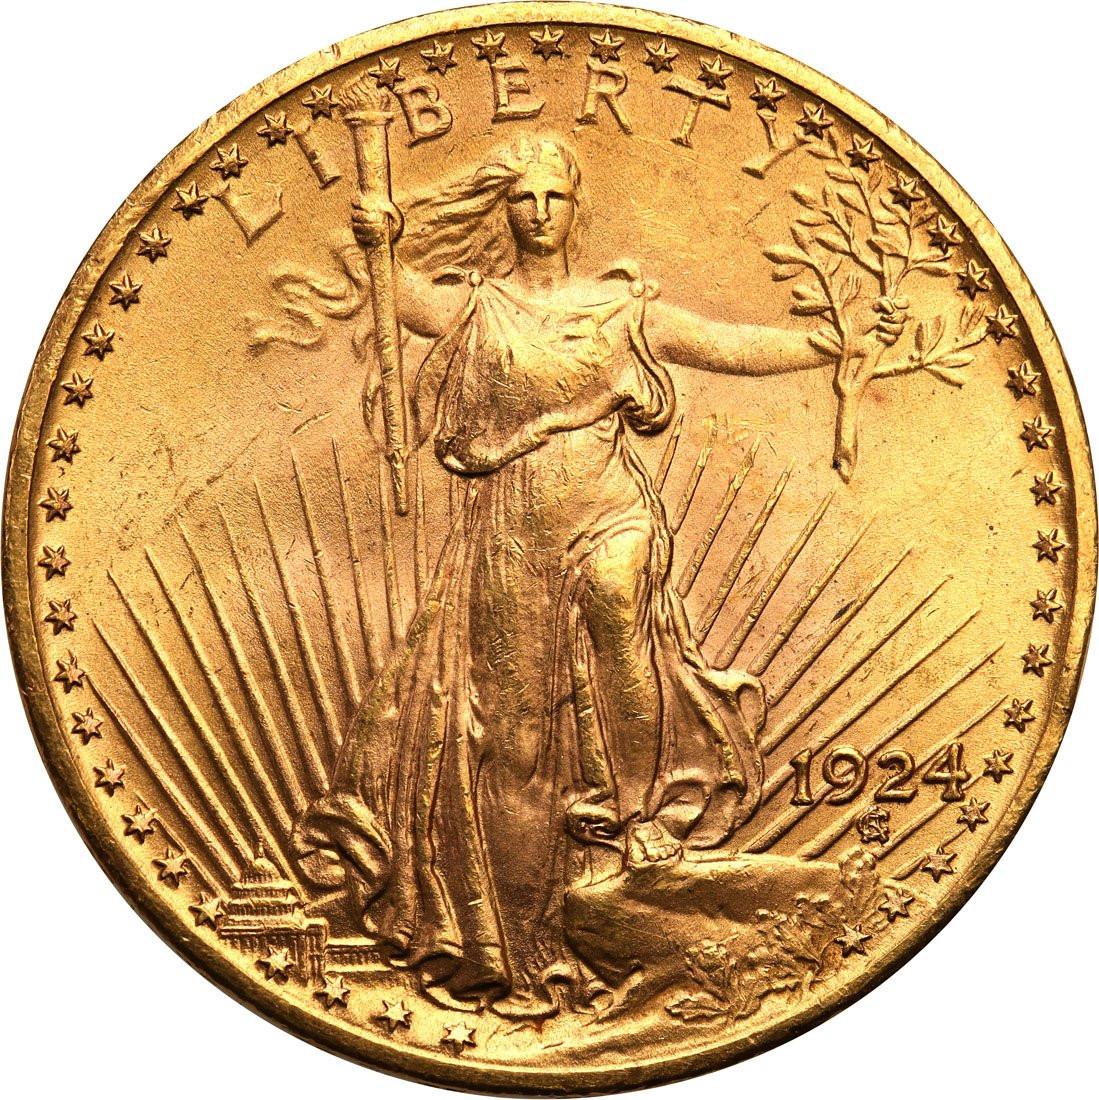 USA. 20 dolarów Saint Gaudens 1924